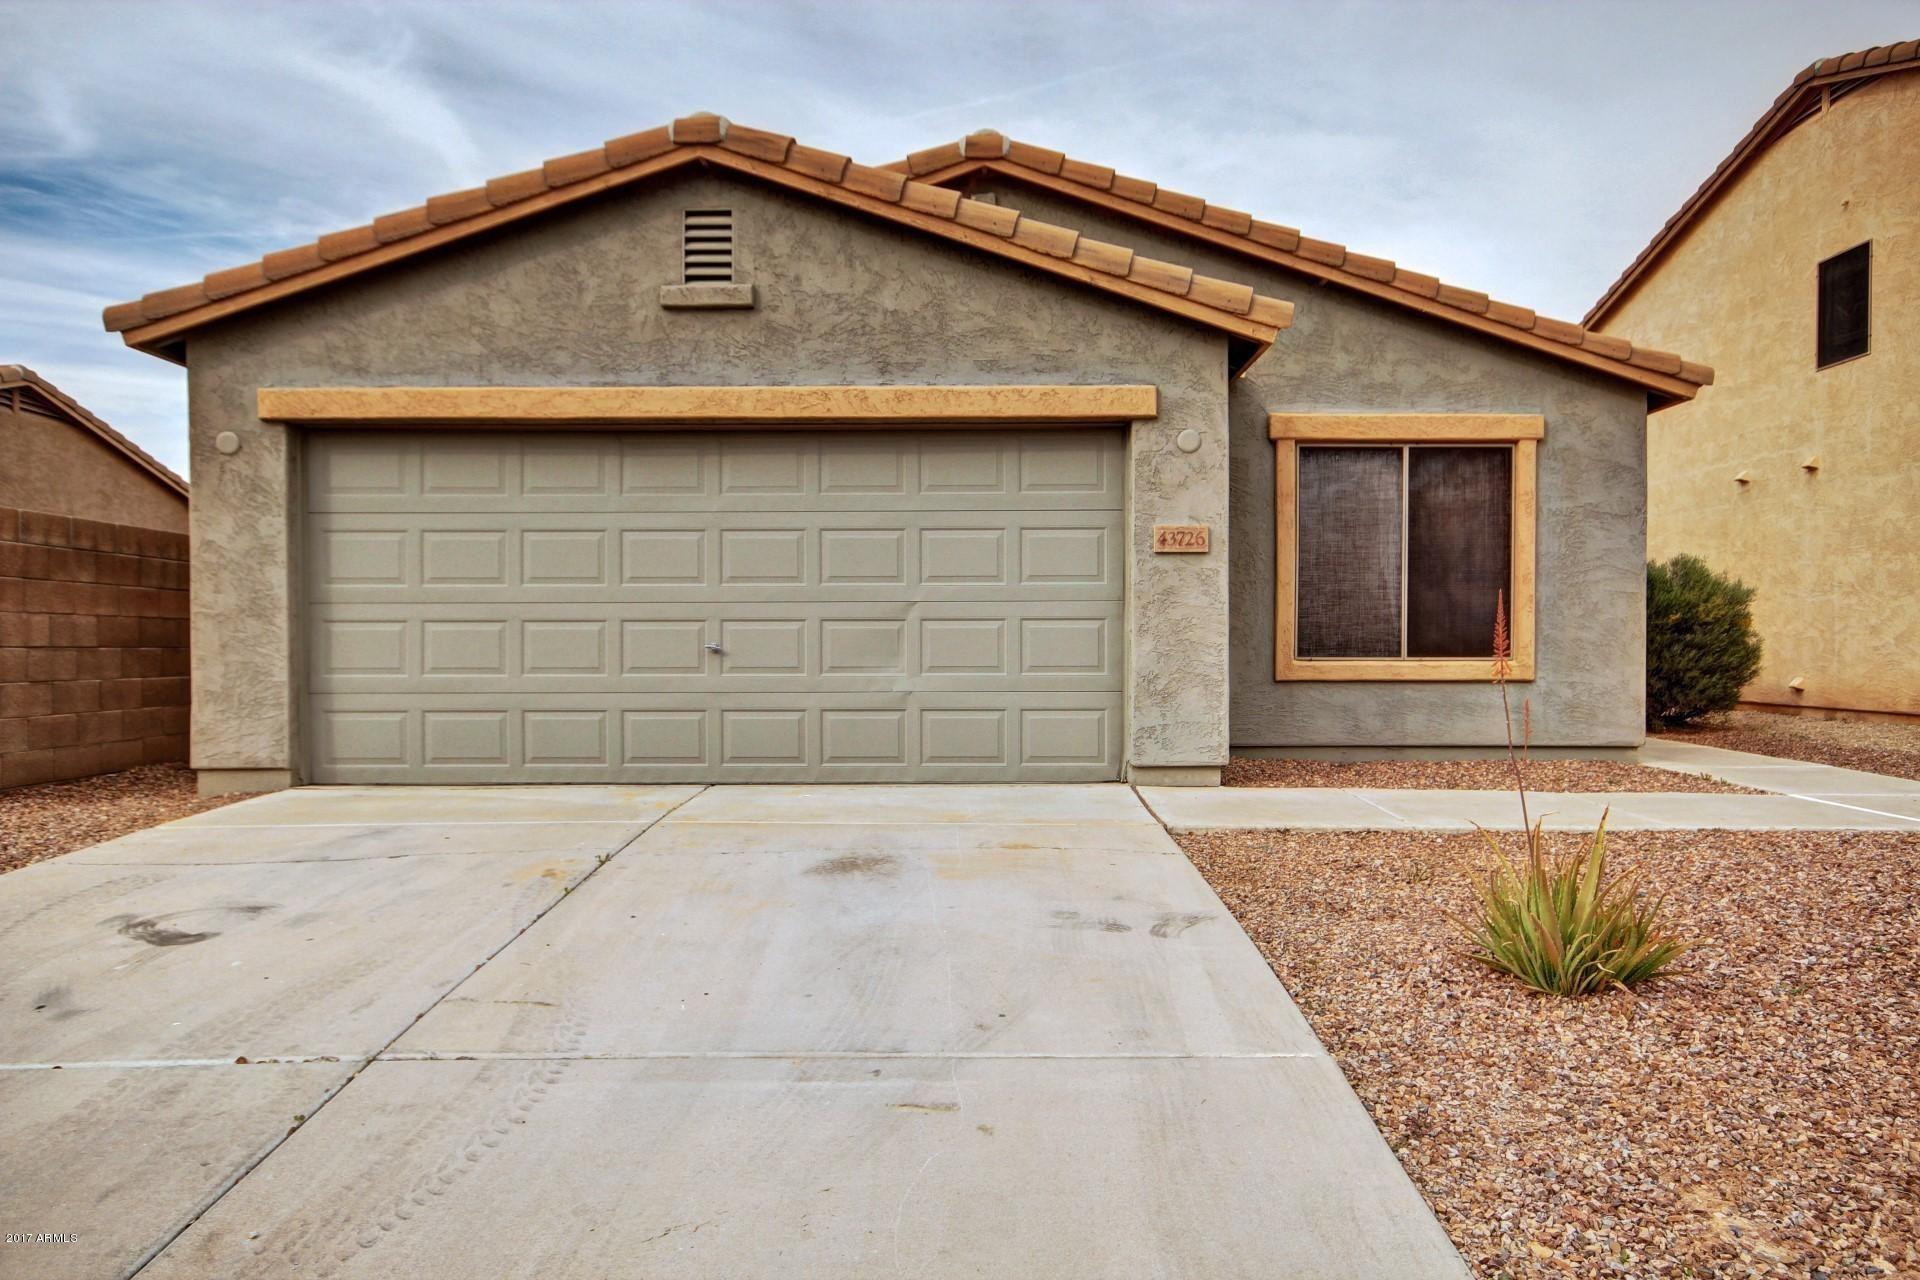 Photo for 43726 W SAGEBRUSH Trail, Maricopa, AZ 85138 (MLS # 6233406)